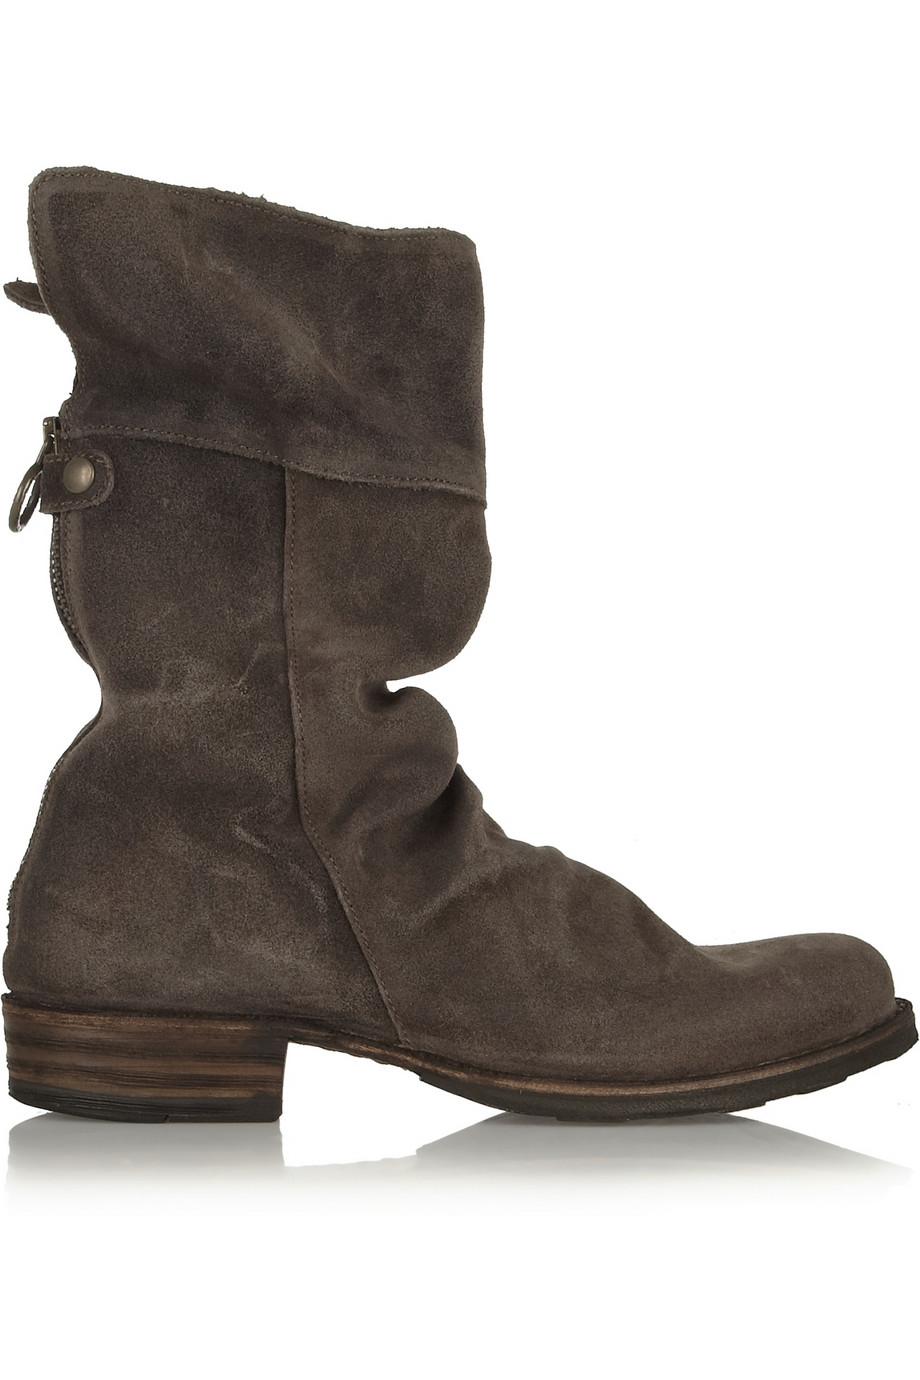 lyst fiorentini baker ella eternity nubuck boots in brown. Black Bedroom Furniture Sets. Home Design Ideas